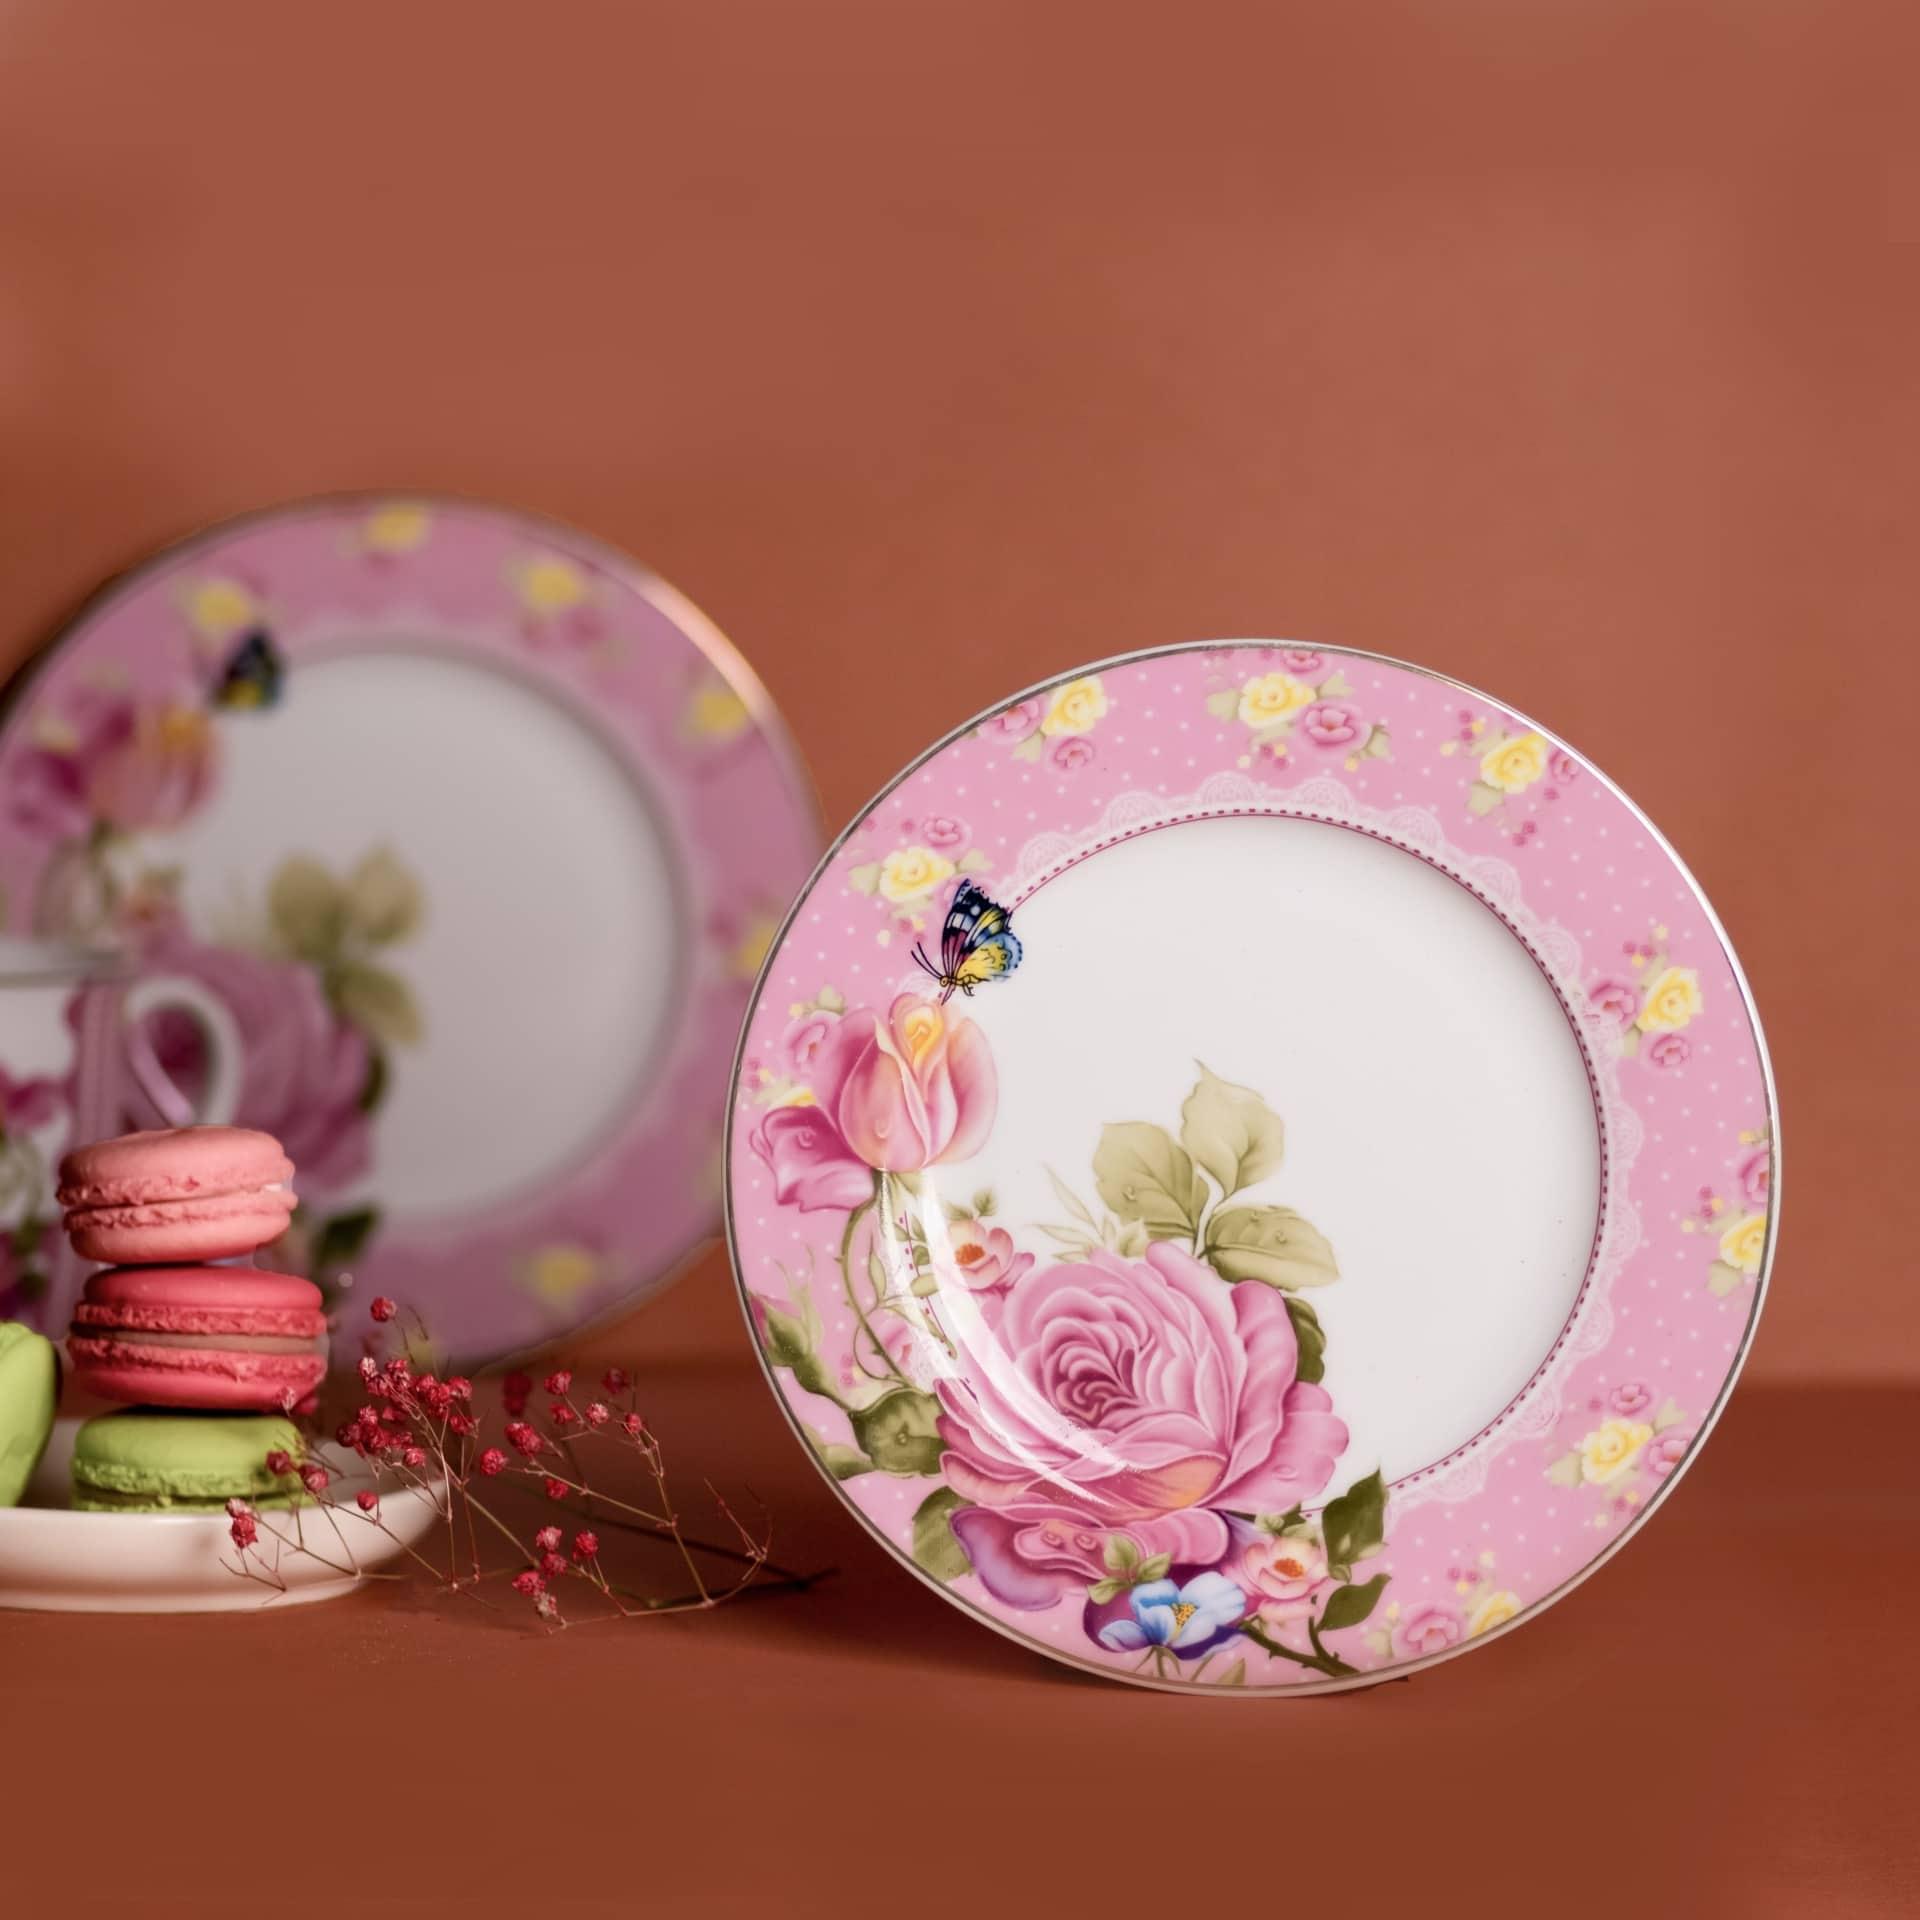 Viola Paeonia Porcelain Dessert Plate